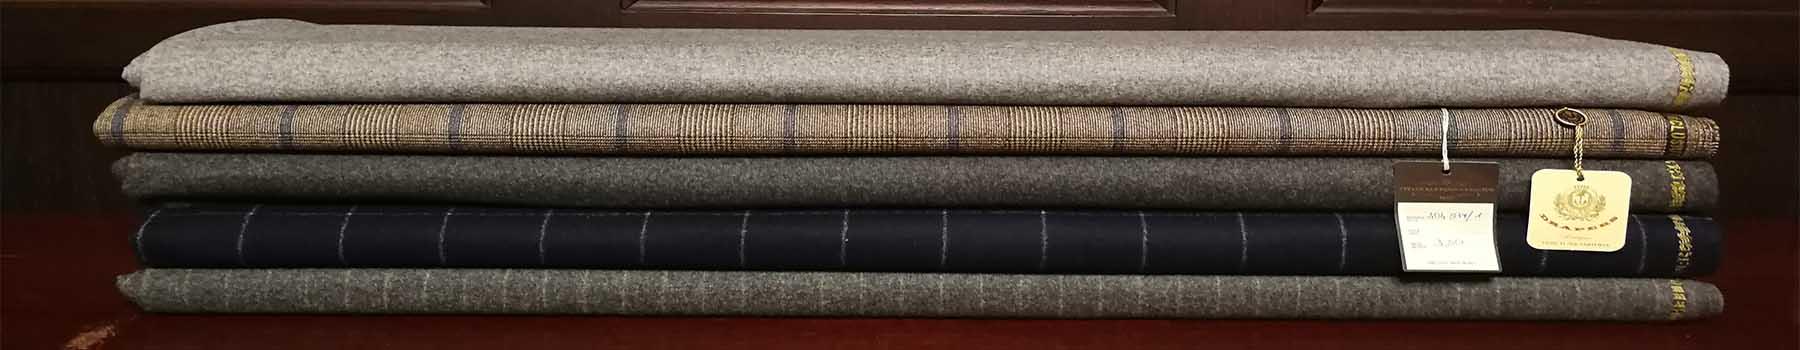 Ways to wear grey flannel